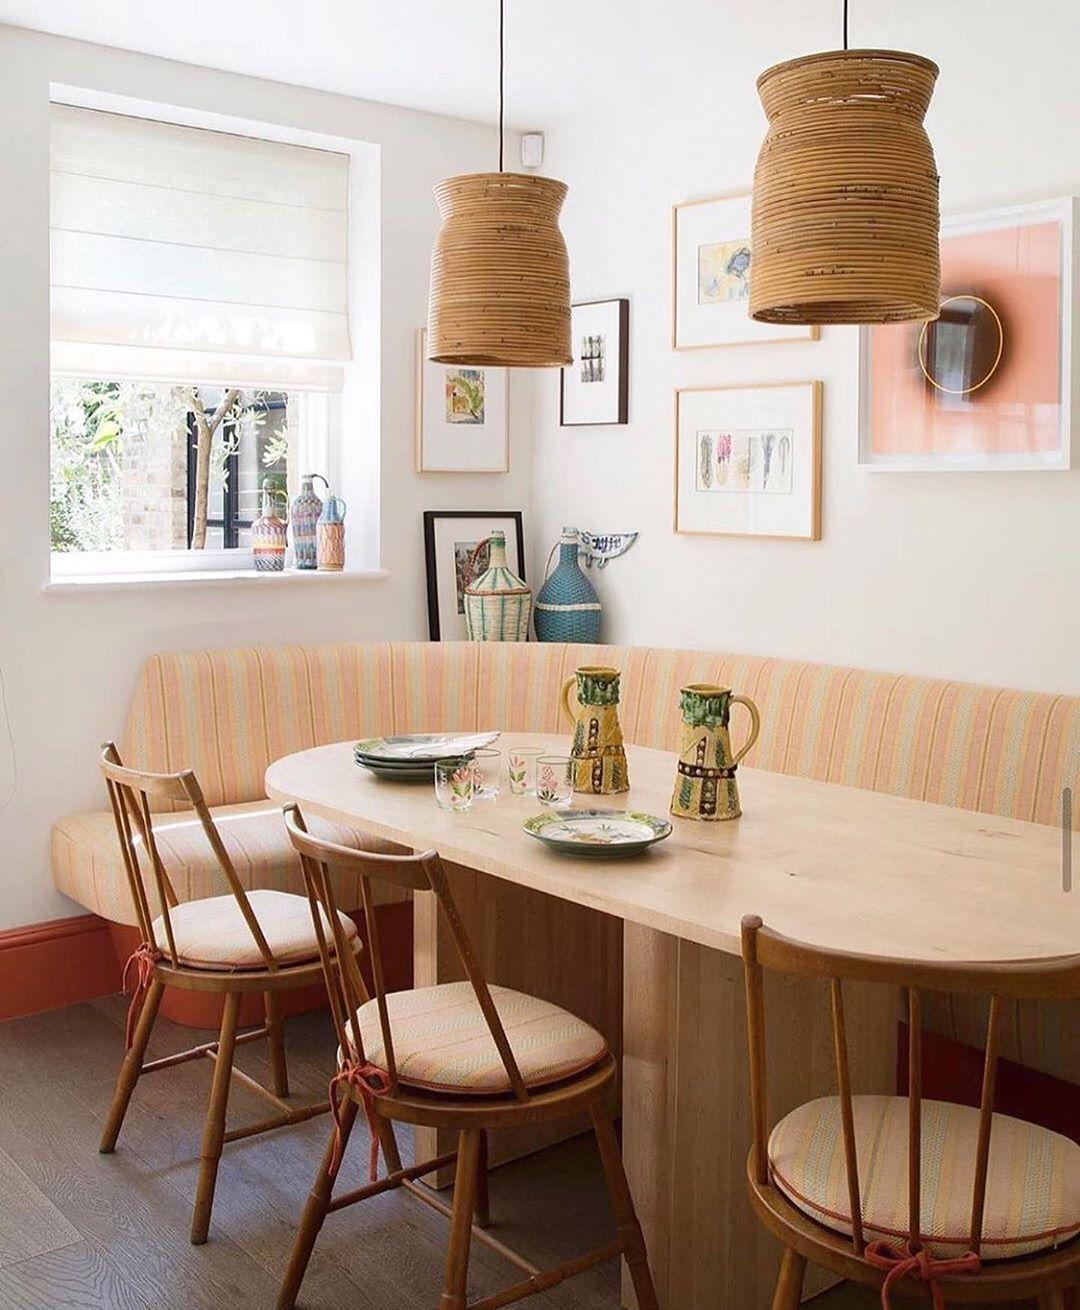 "COLOMBO HIRST on Instagram: ""Perfect breakfast nook 📰 ☕️@pierre.yovanovitch . . . . . #ColomboHirst #DesignIdeas #InteriorDetails #InteriorDecor #AmazingArchitecture…"""